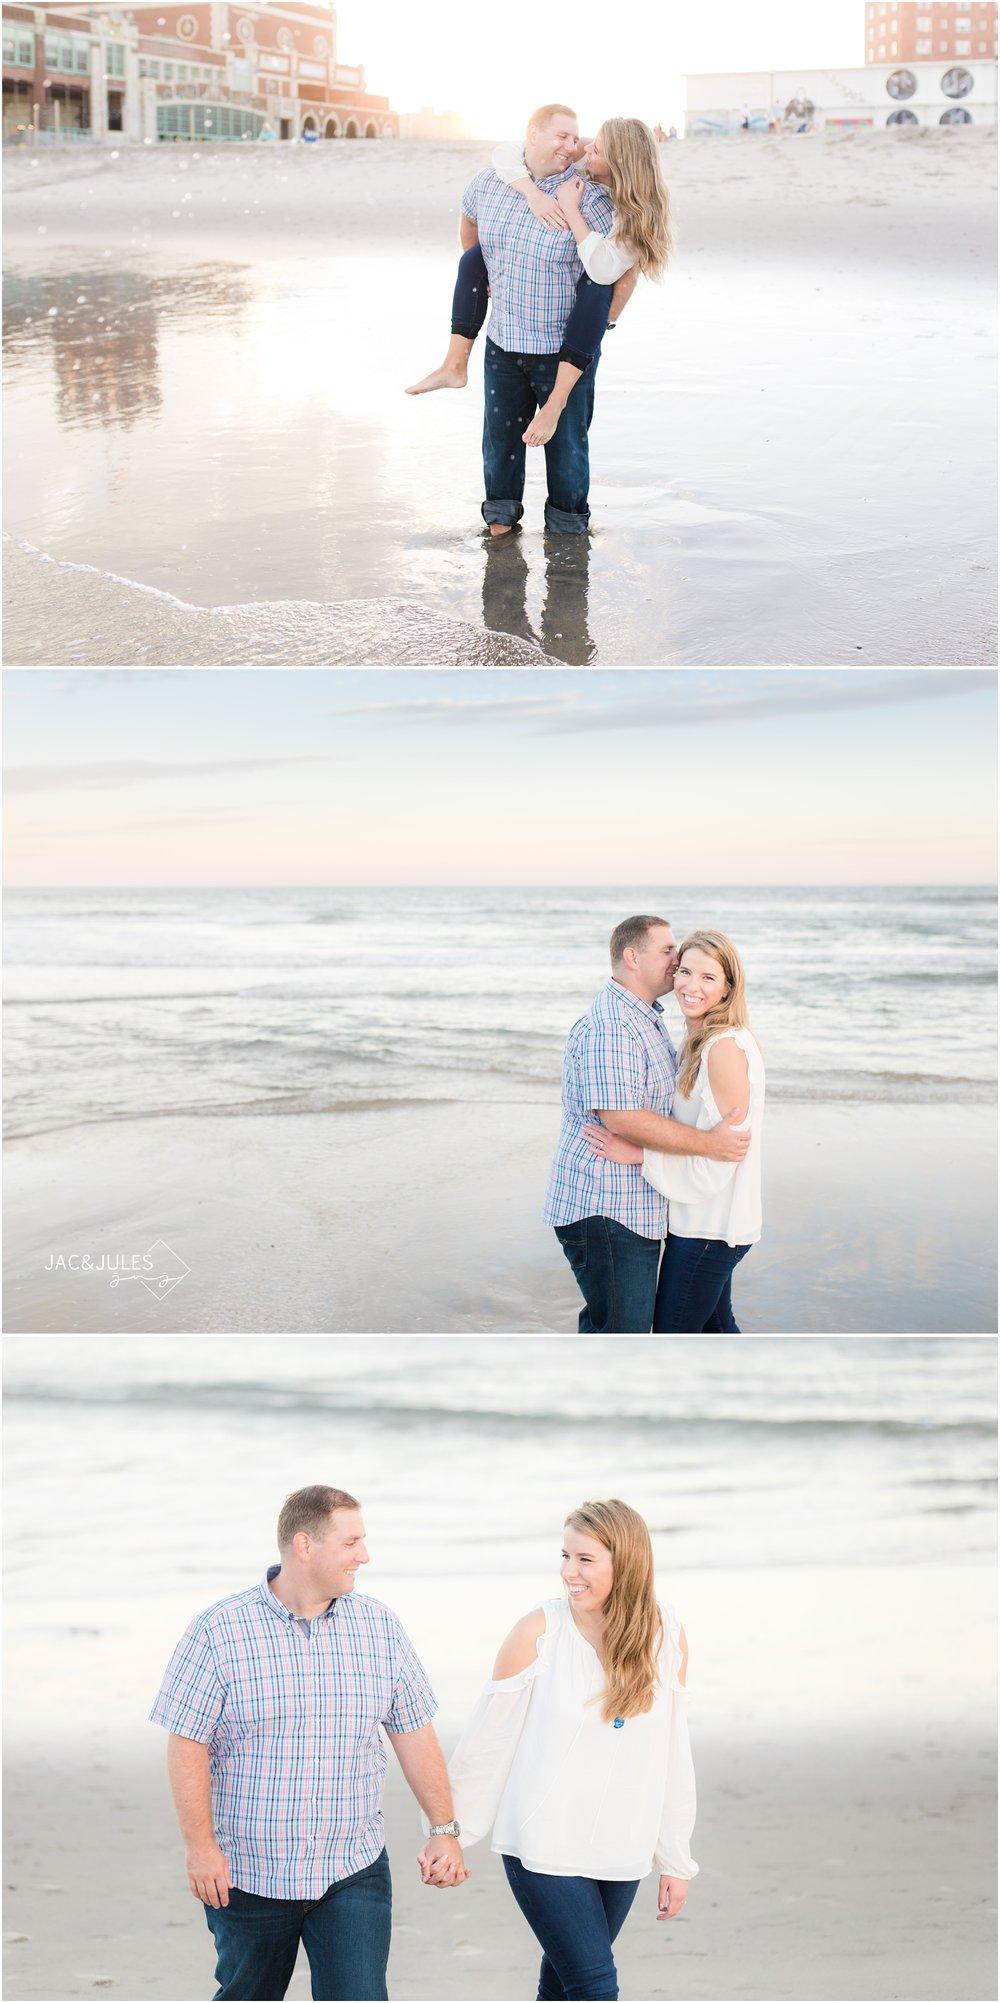 Romantic beach engagement photos in Asbury Park, NJ.